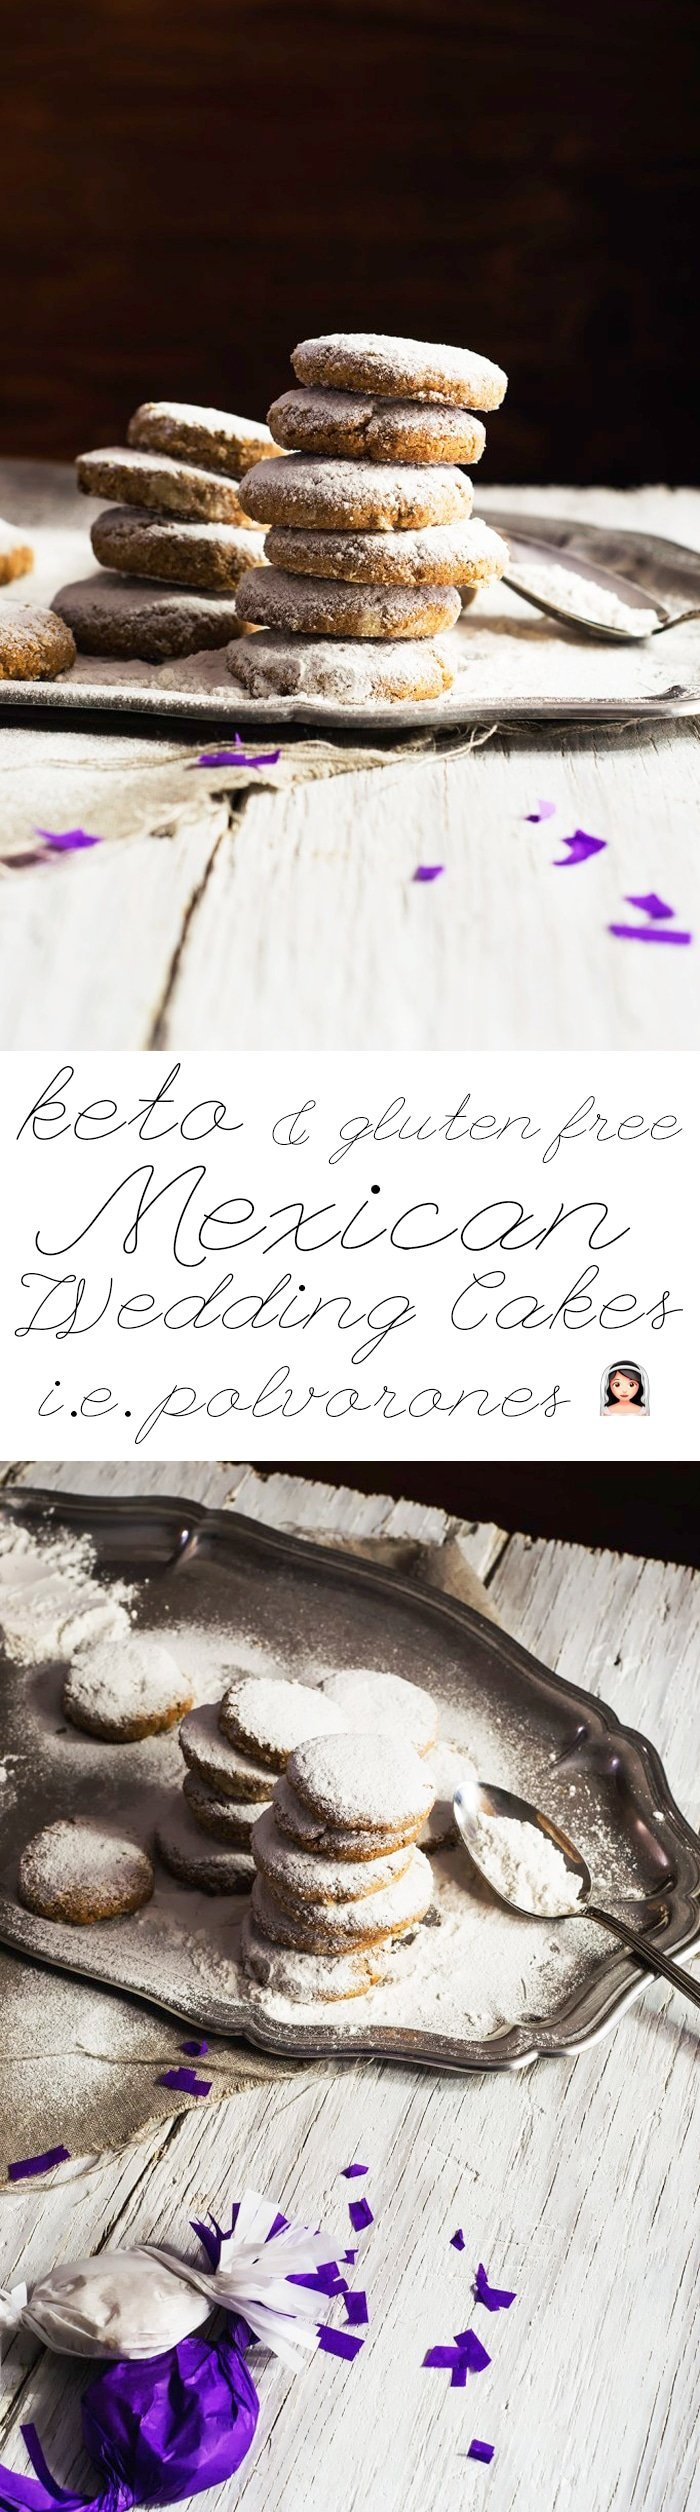 Gluten Free Wedding Cakes San Francisco